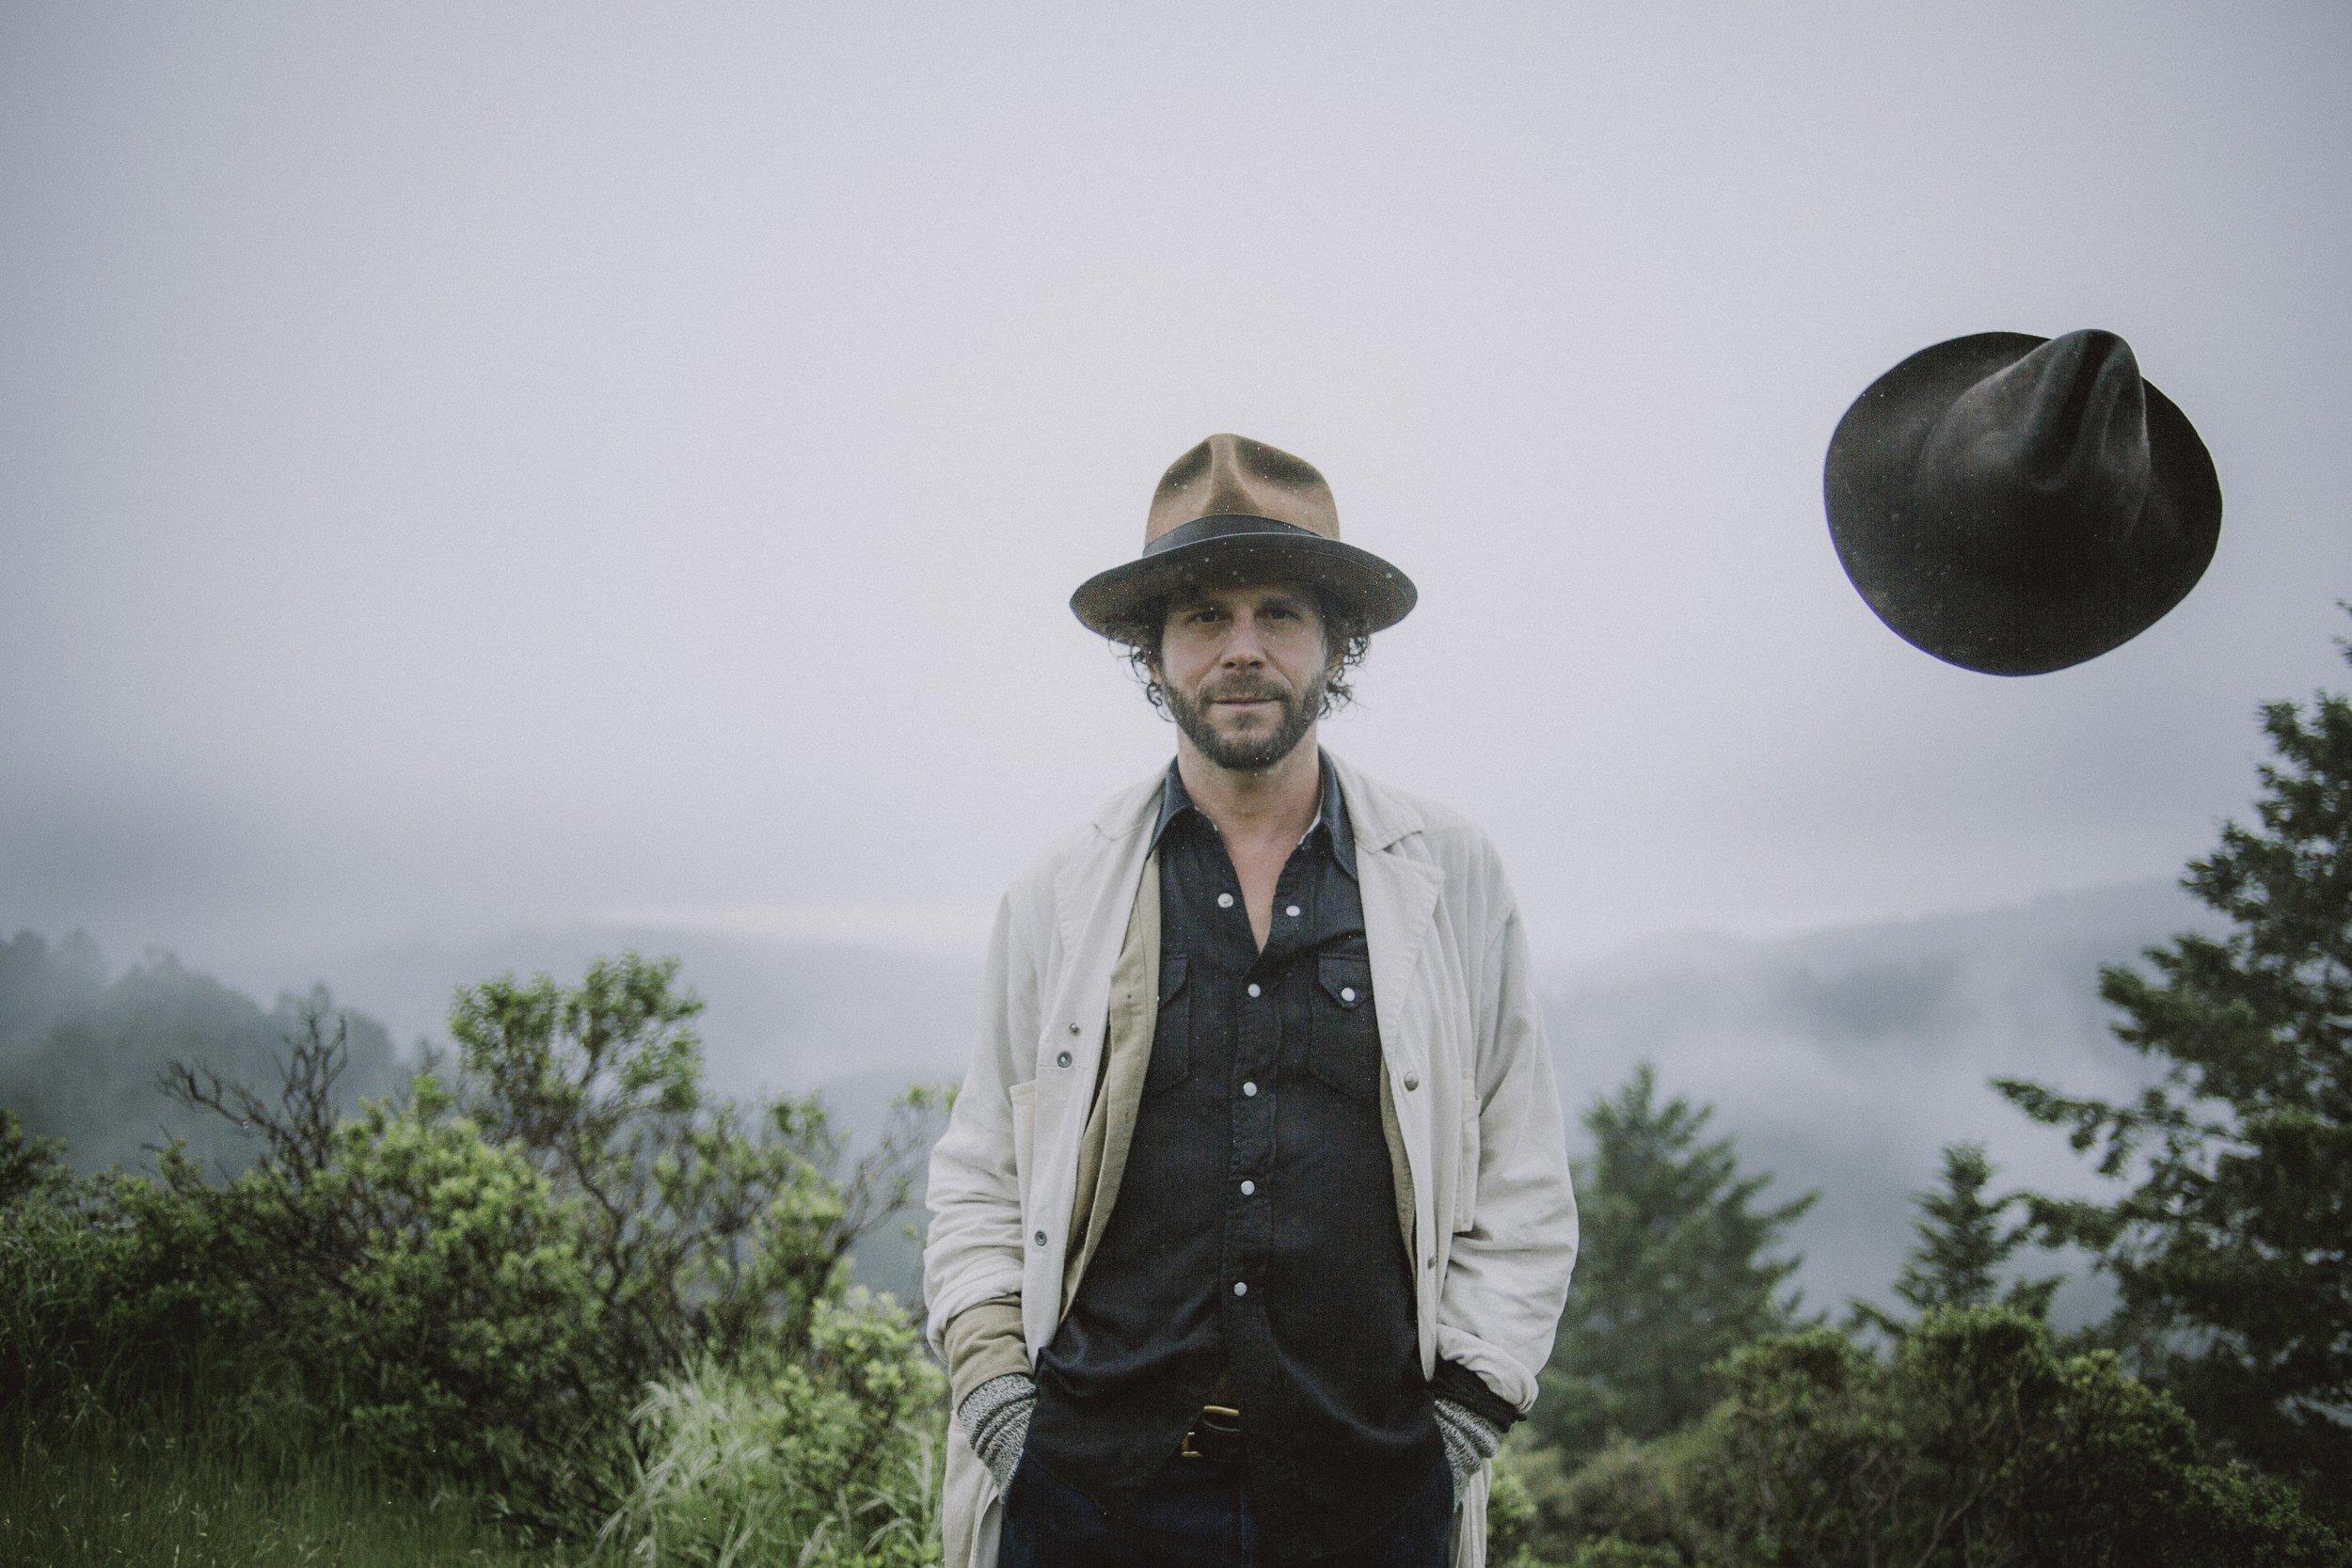 Langhorne Slim Hat Toss - Harvey Robinson